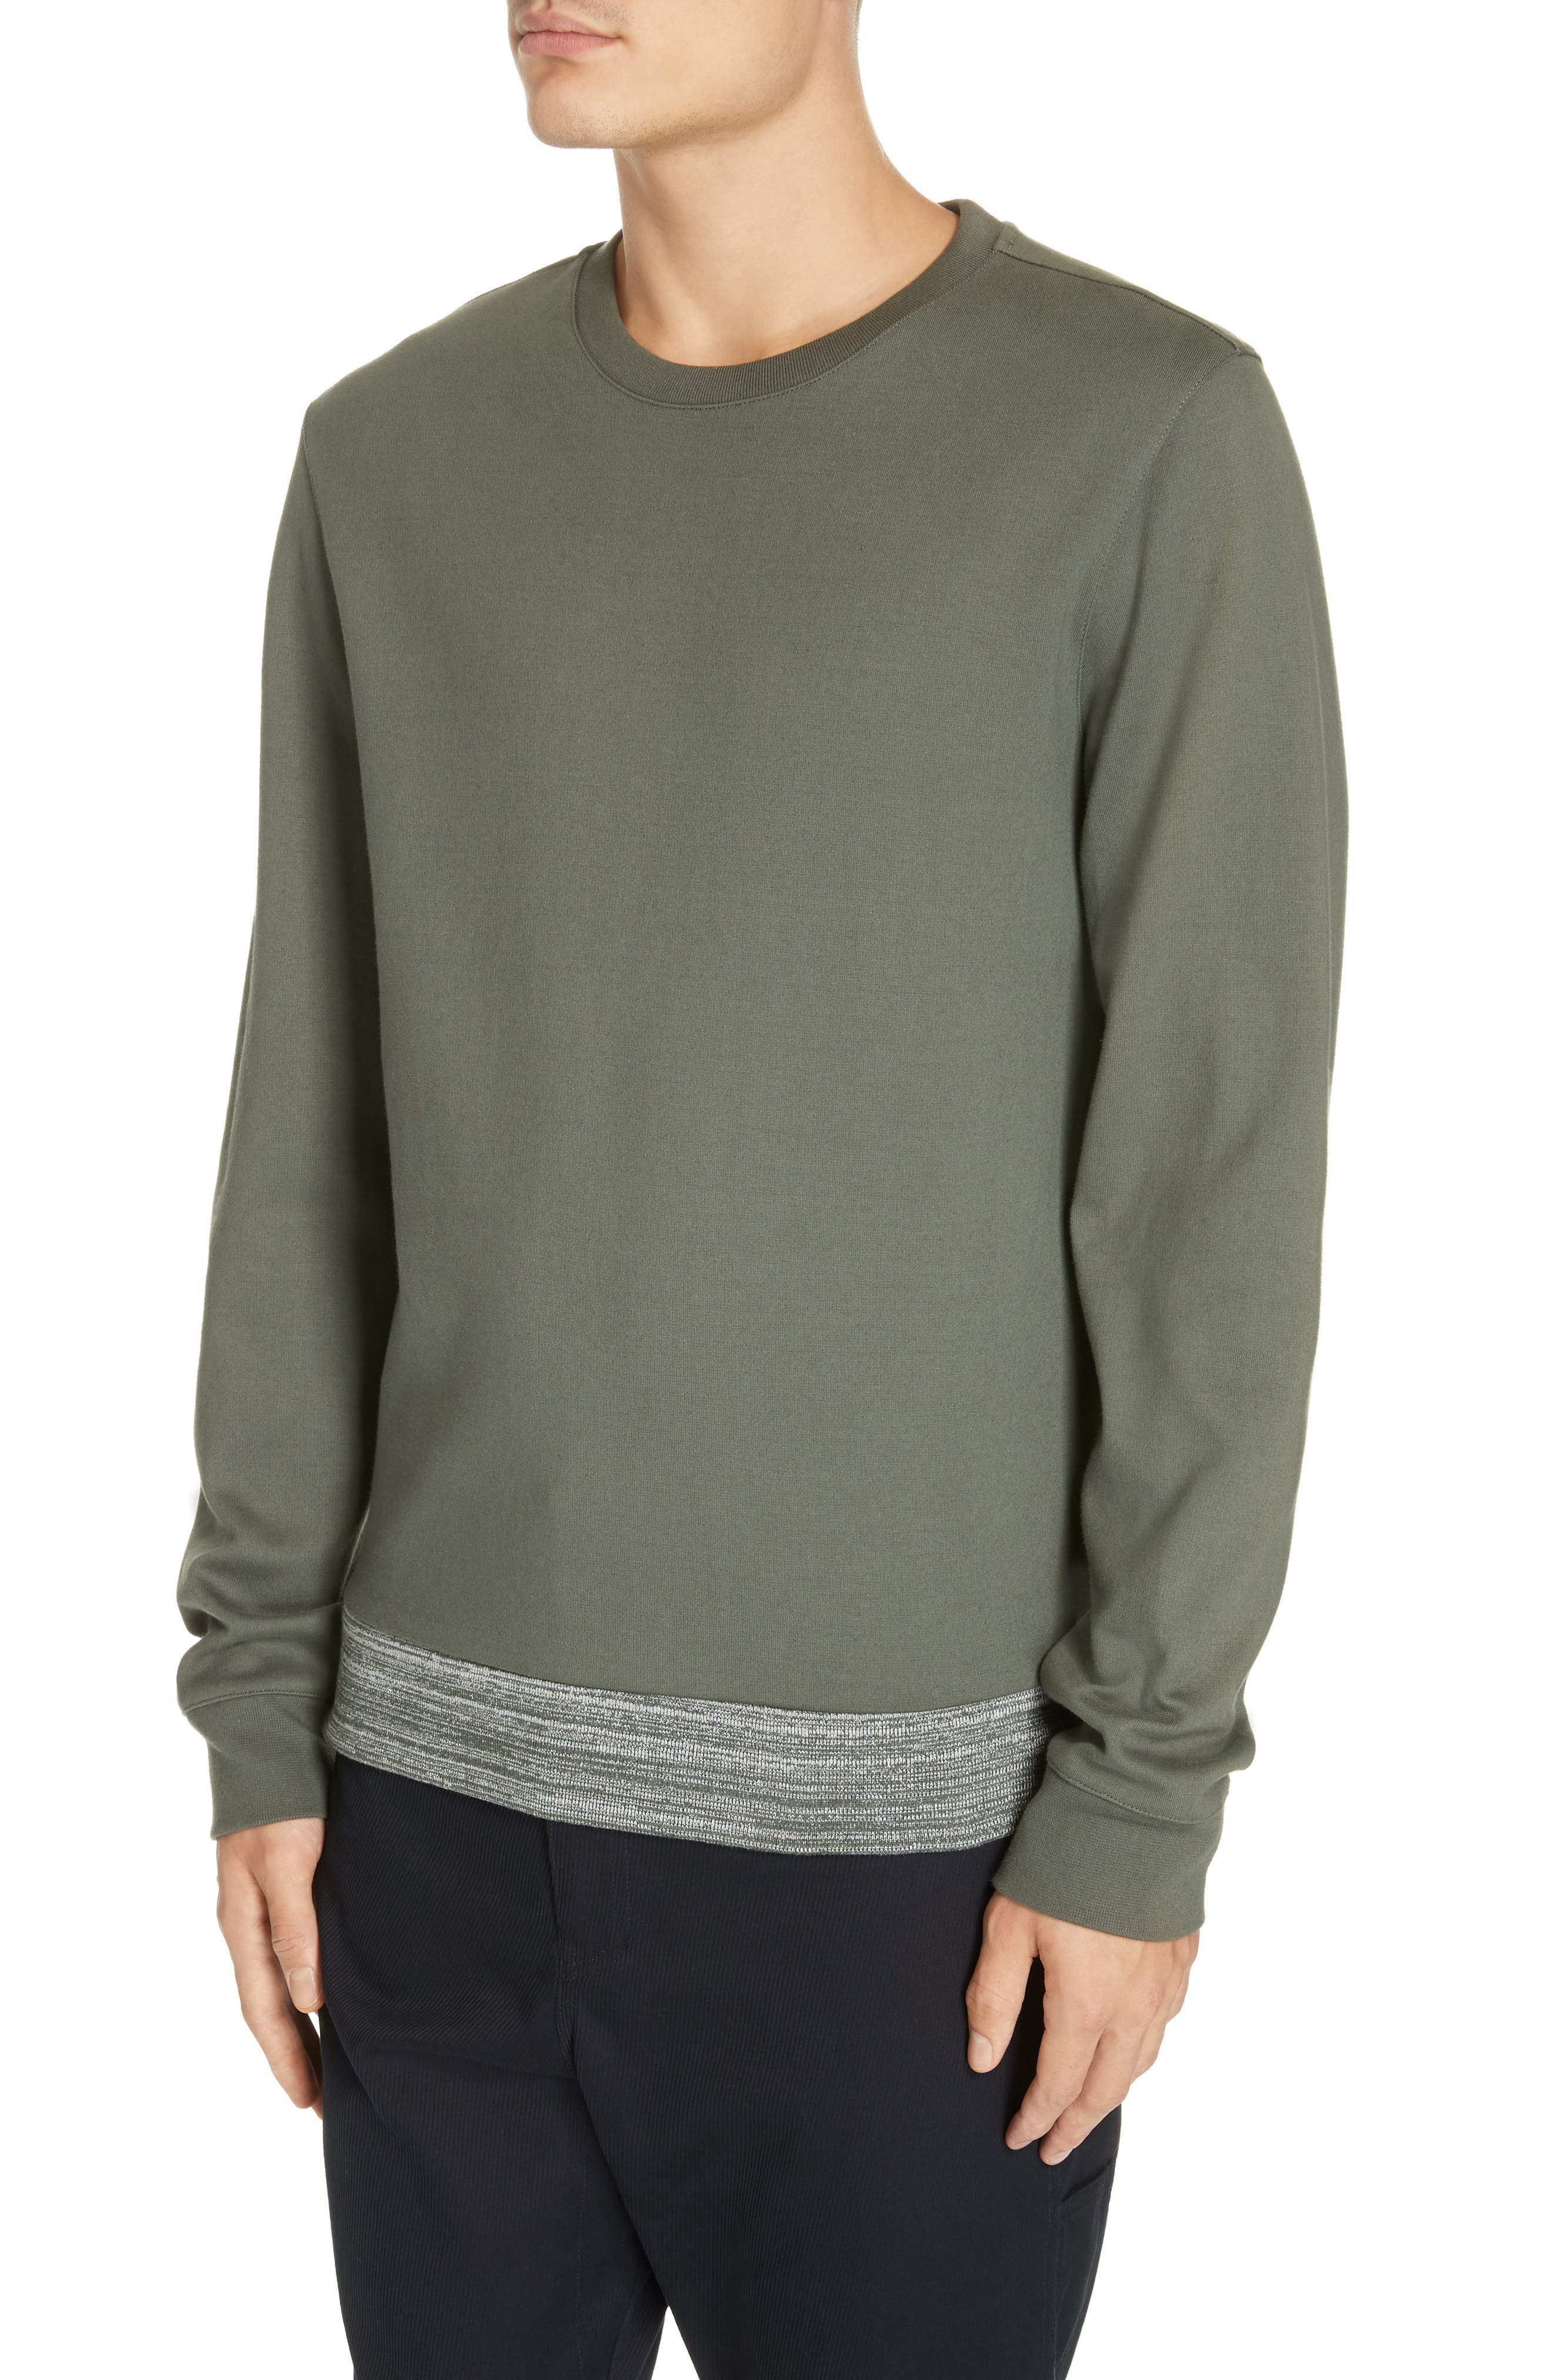 Jeremie Space Dye Sweatshirt,                             Alternate thumbnail 4, color,                             KHAKI